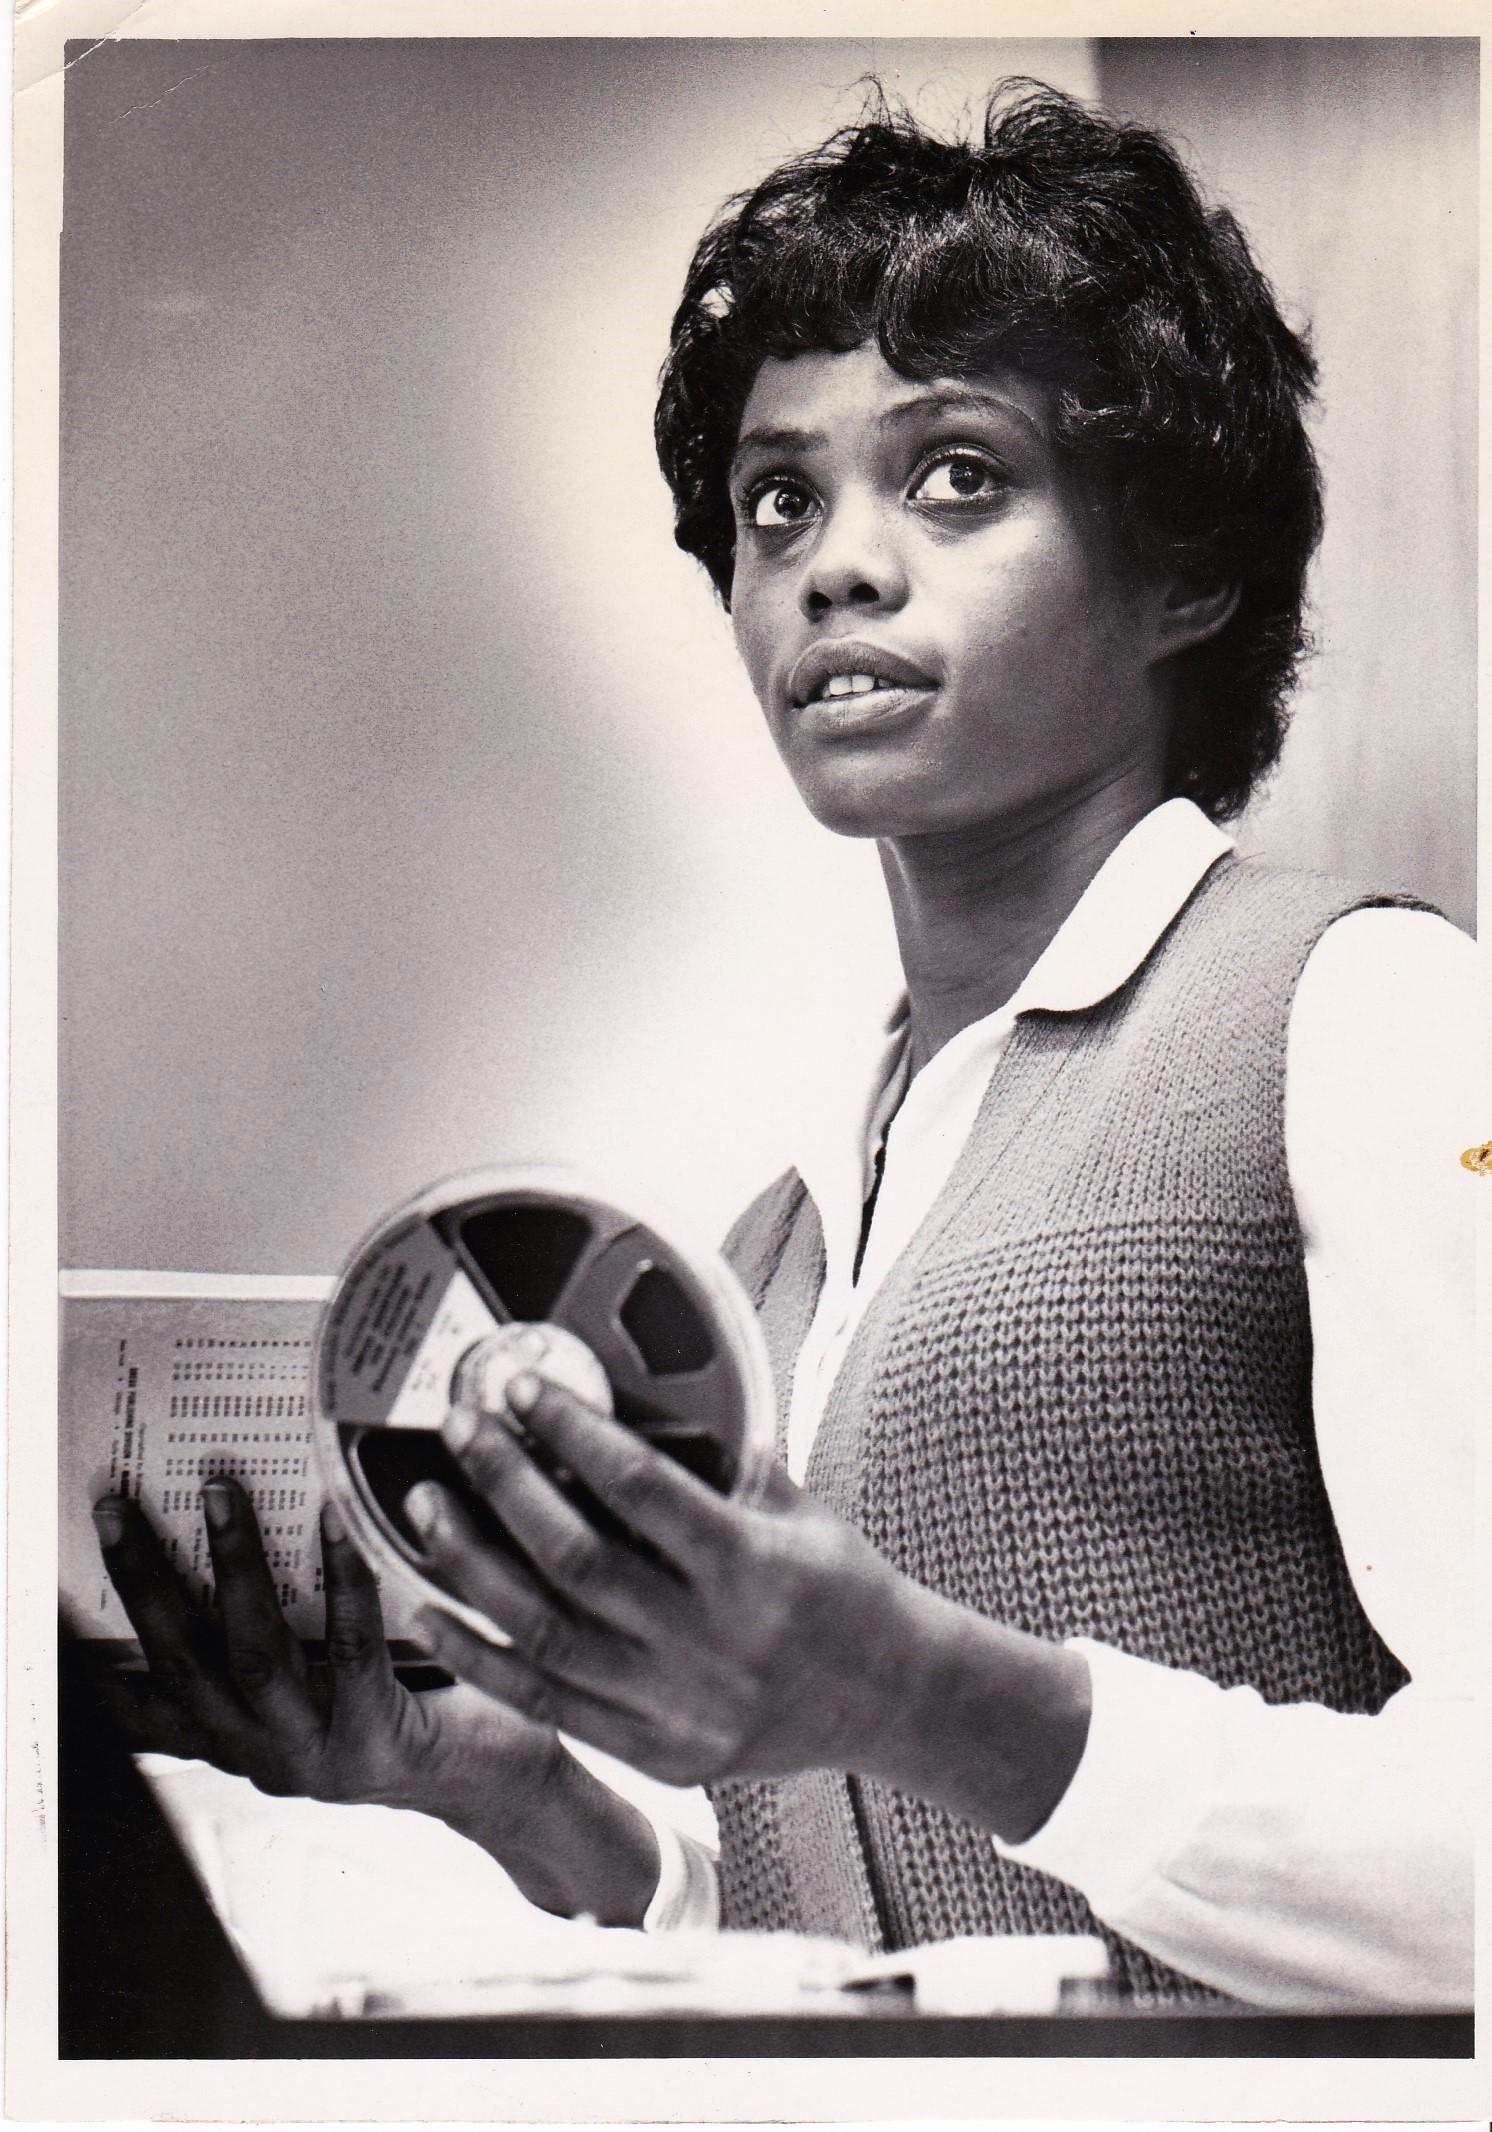 '66 Lillie Carpenter